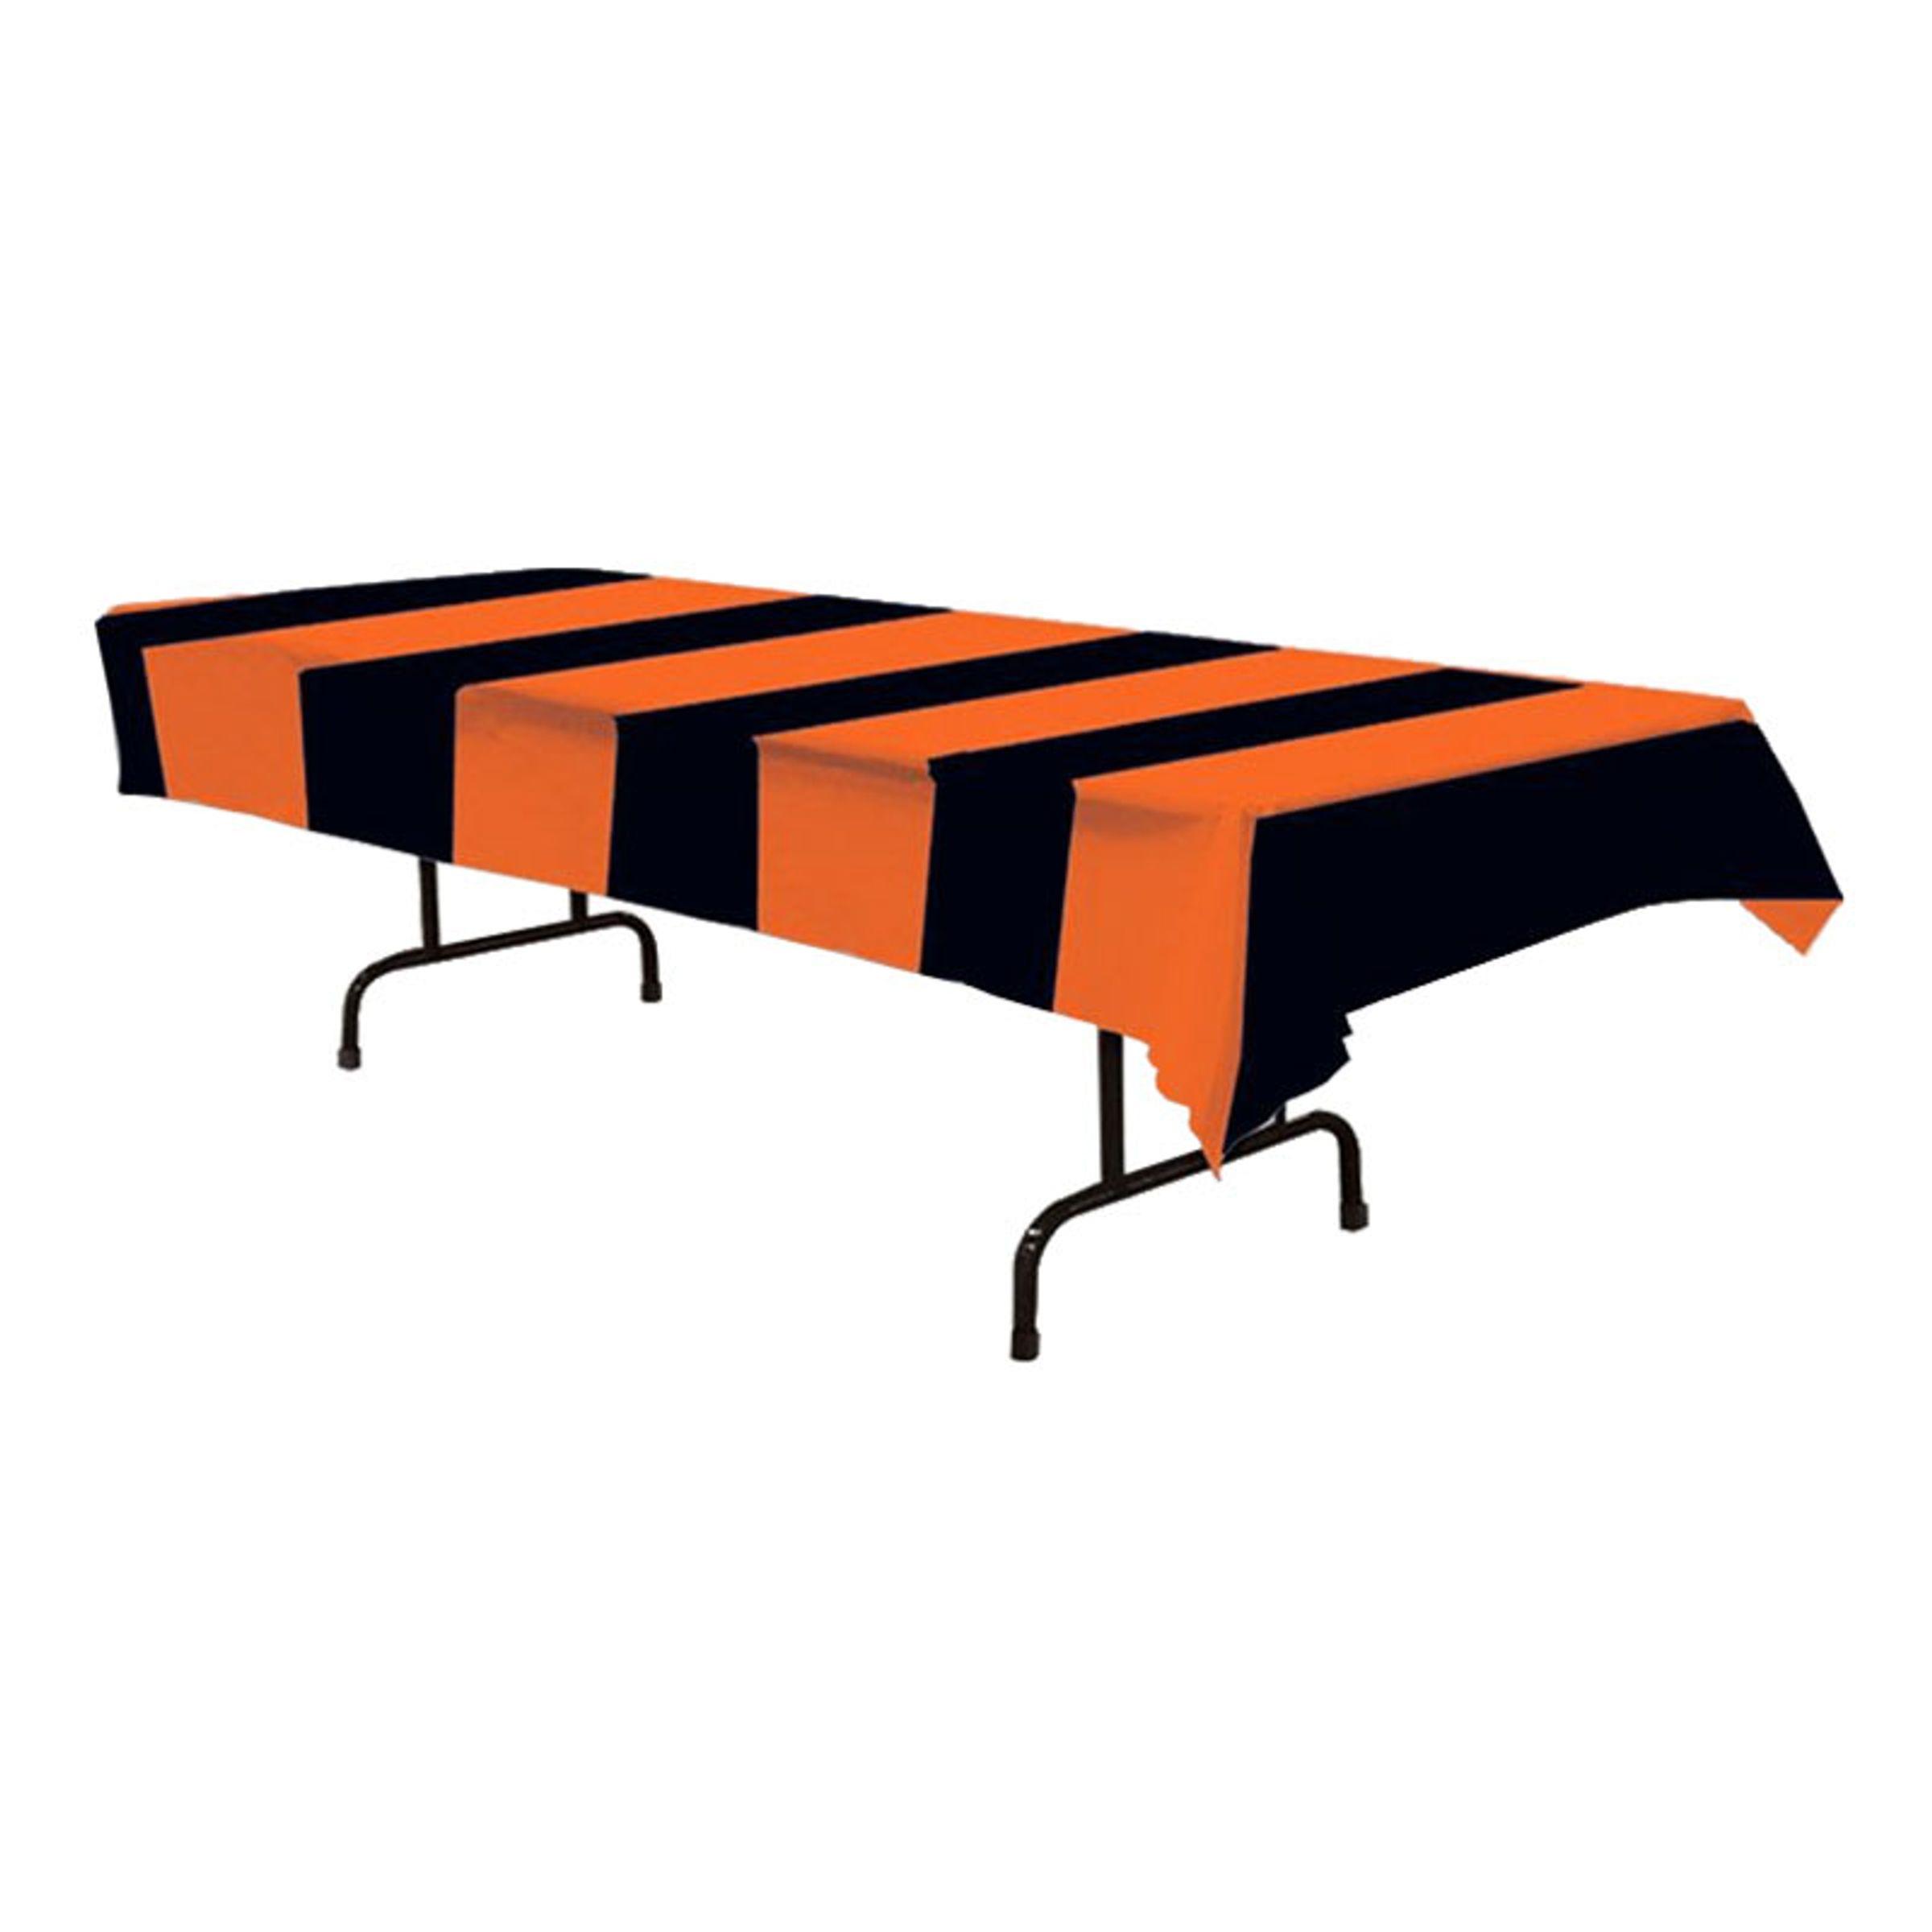 Bordsduk Svart/Orange Randig